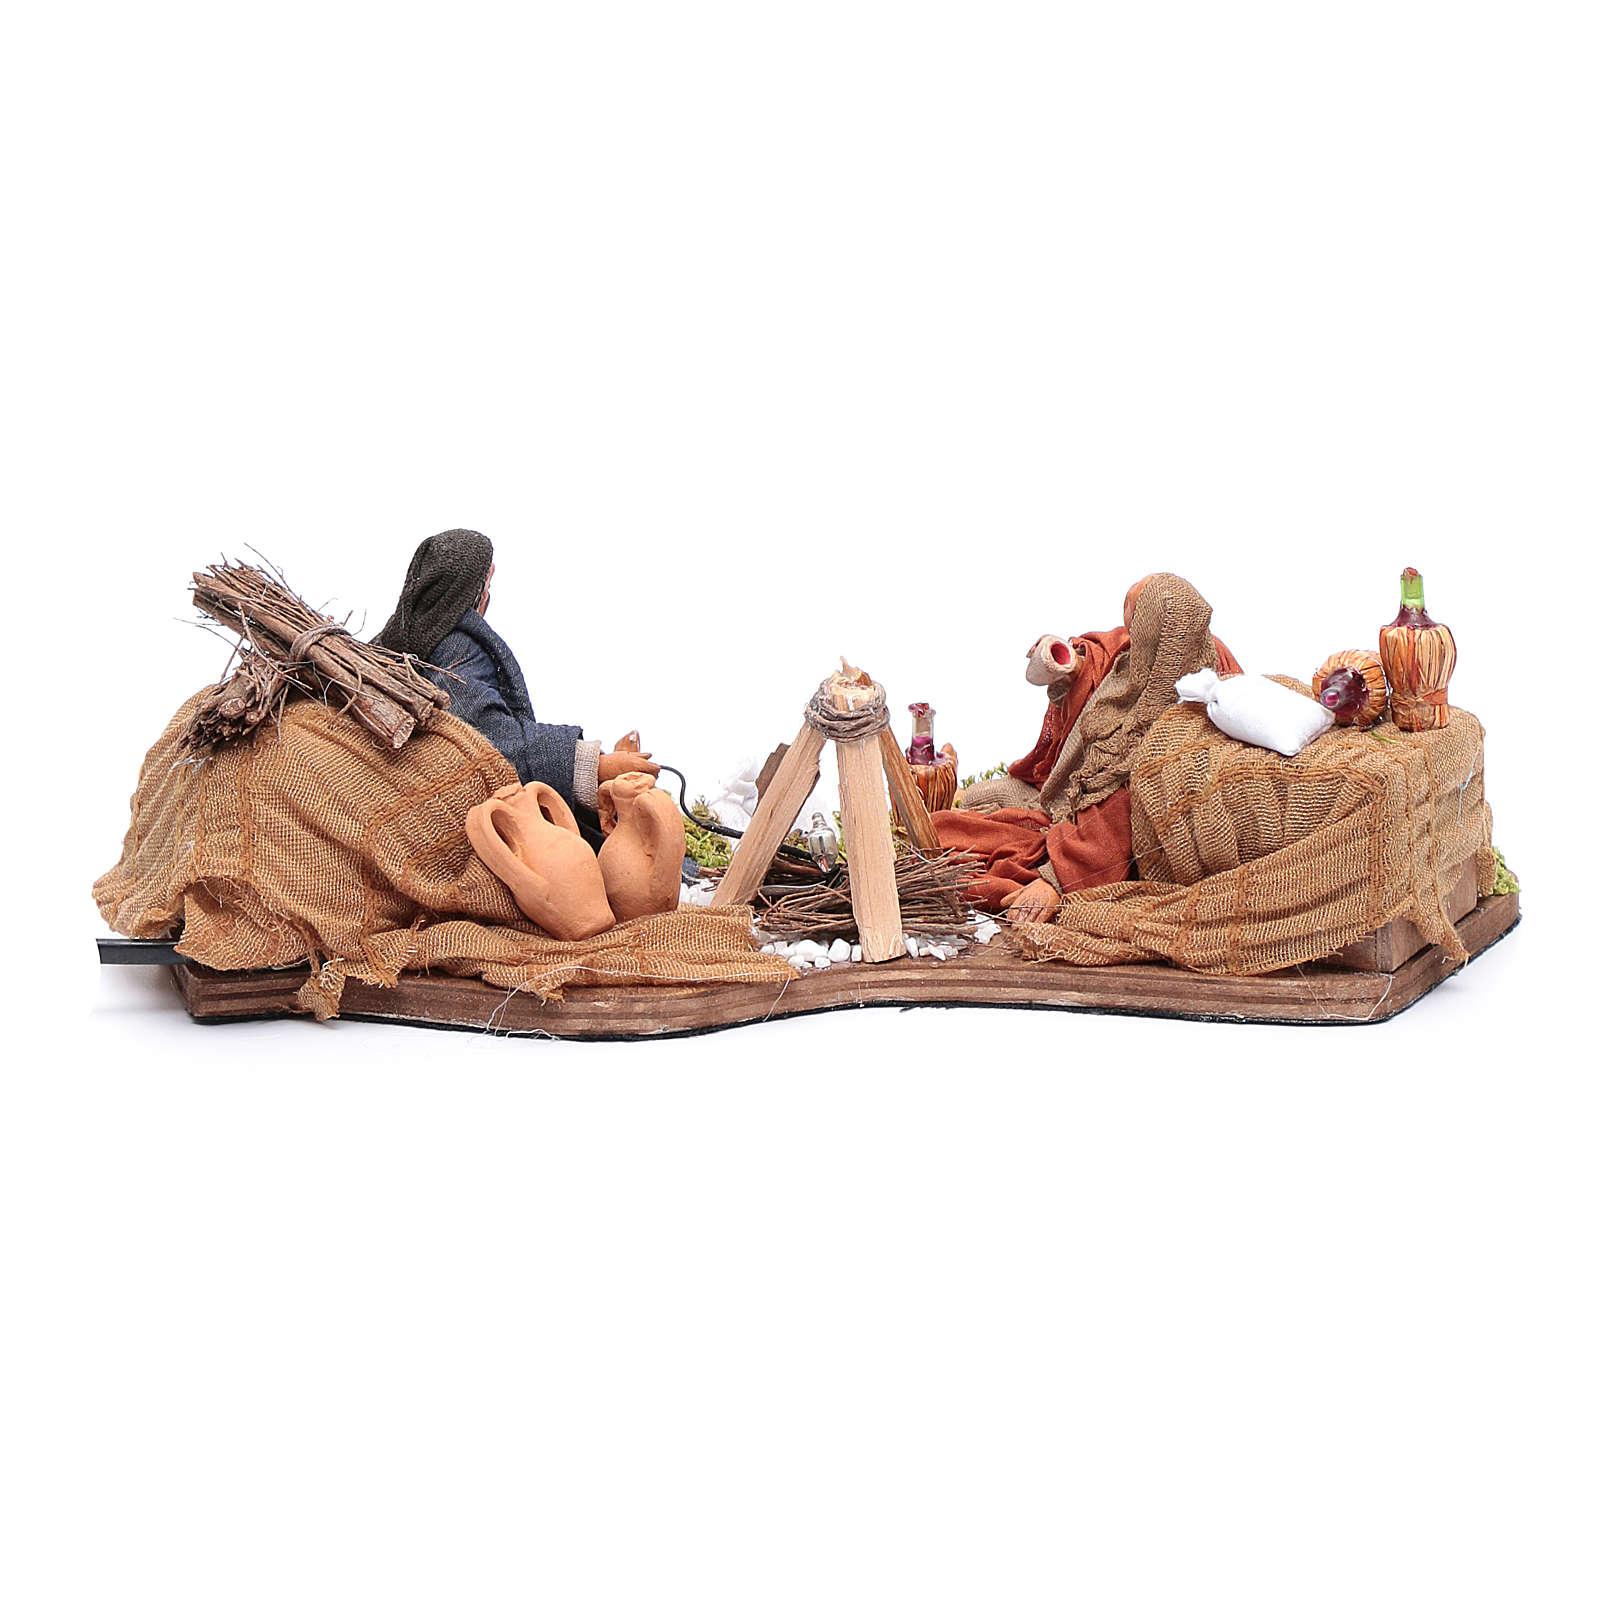 Moving bivouac series for nativity scene 4